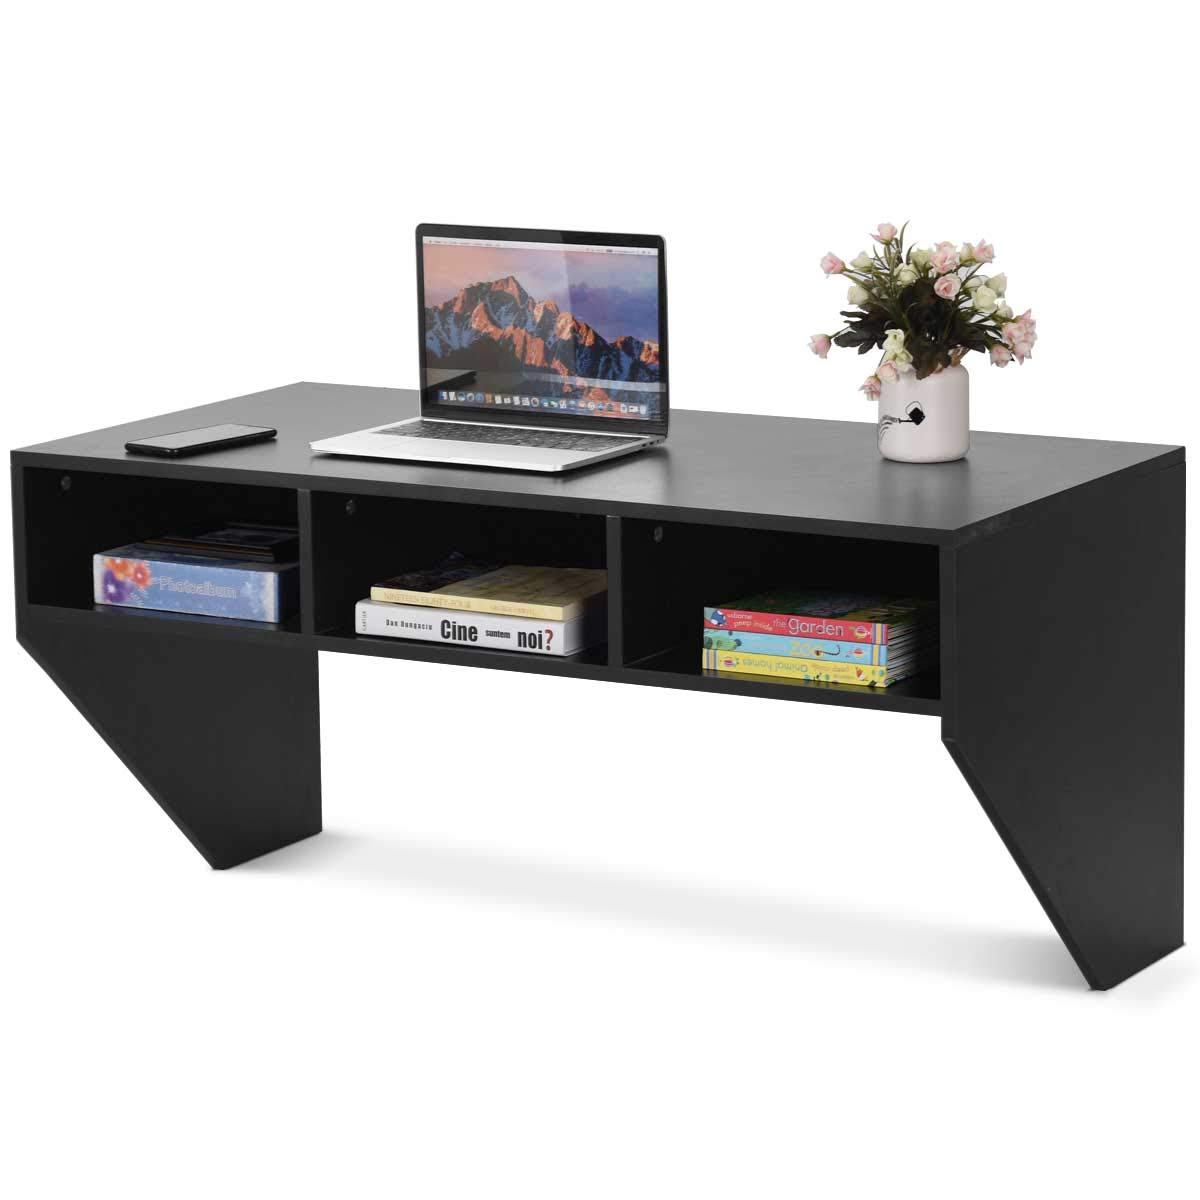 Black Wall Mounted Floating Desk, Wall Mounted Console, Modern Wall Mount Storage Shelf by WATERJOY